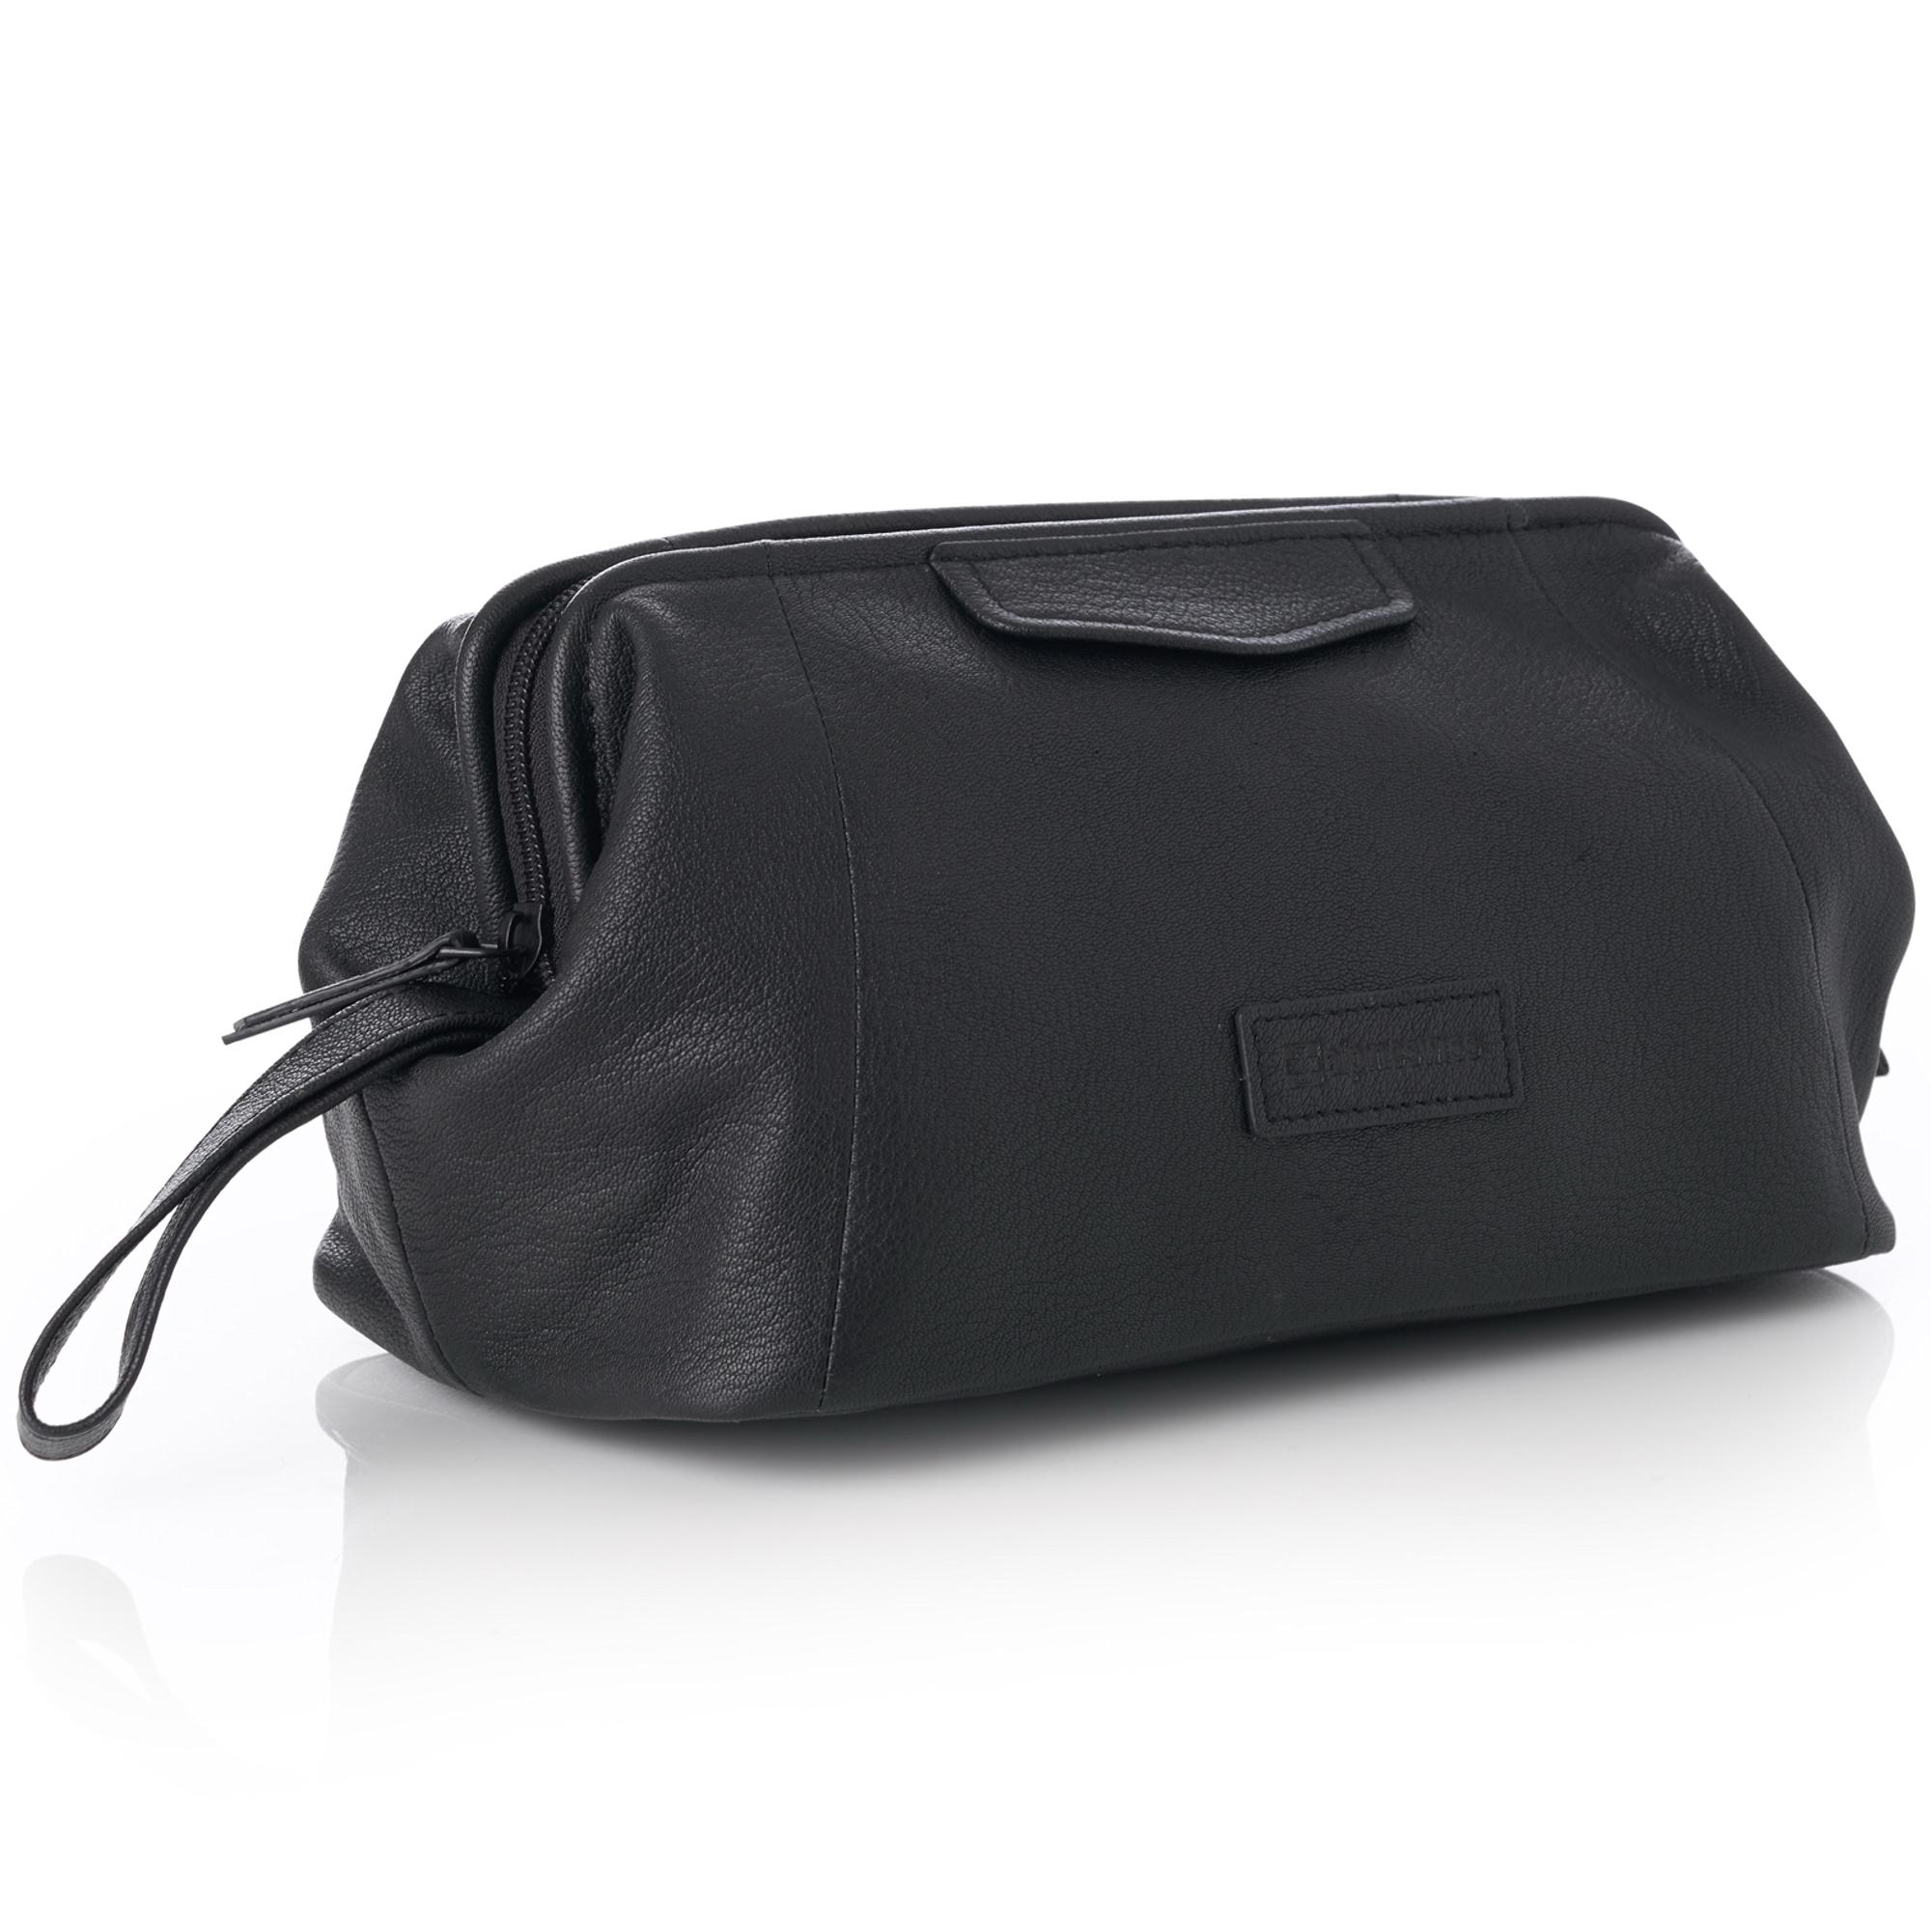 1e2f859b072a Alpine Swiss Lauter Toiletry Bag Genuine Leather Shaving Kit Dop Kit Travel  Case